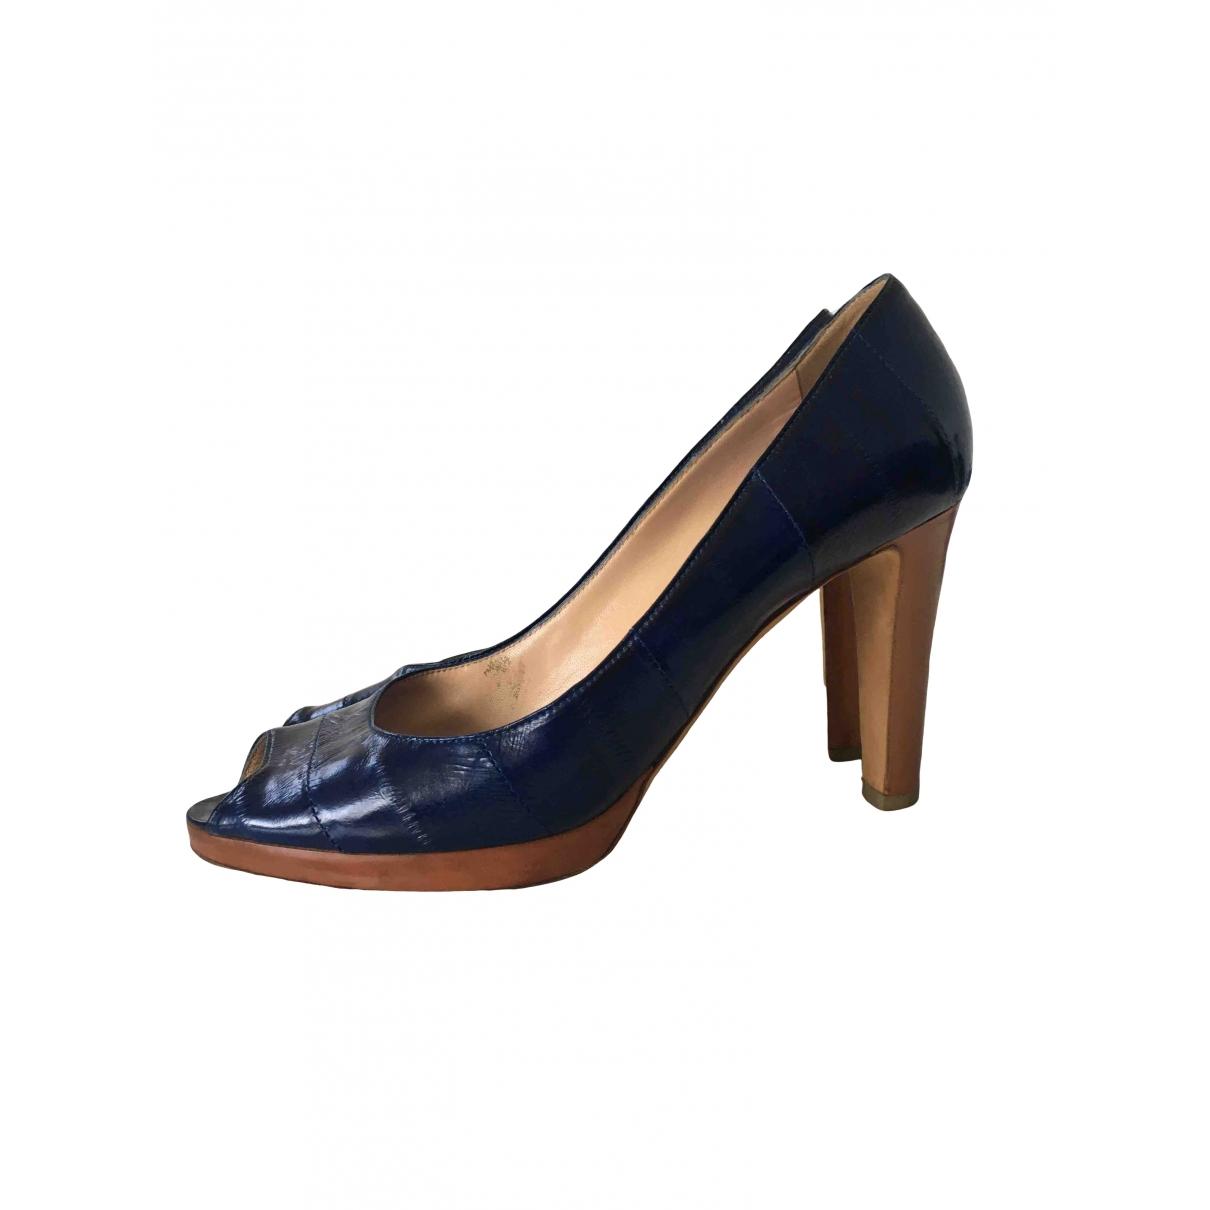 Sergio Rossi \N Blue Leather Heels for Women 38 EU